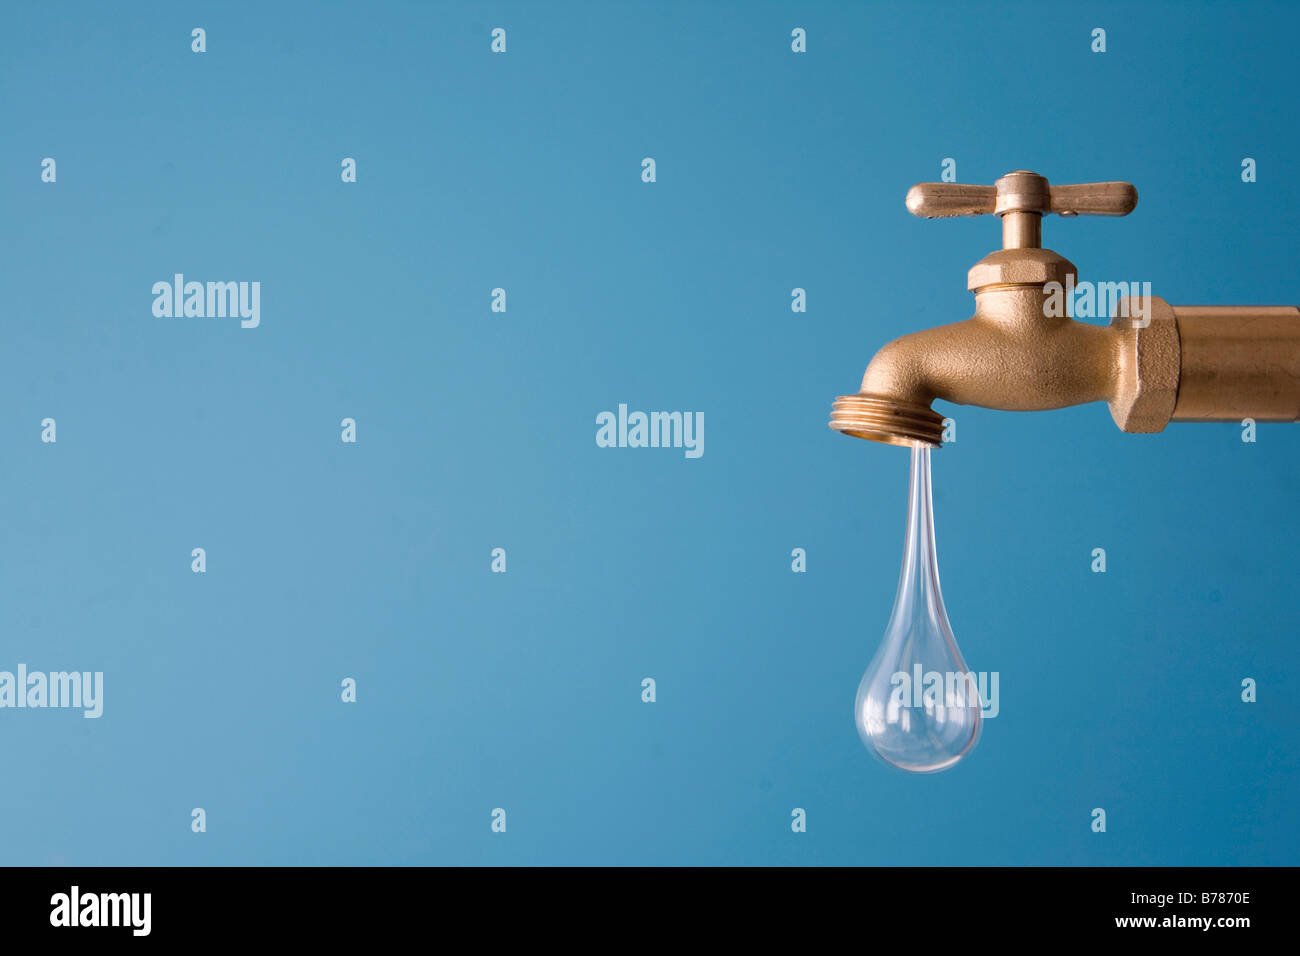 faucet stockfotos faucet bilder alamy. Black Bedroom Furniture Sets. Home Design Ideas